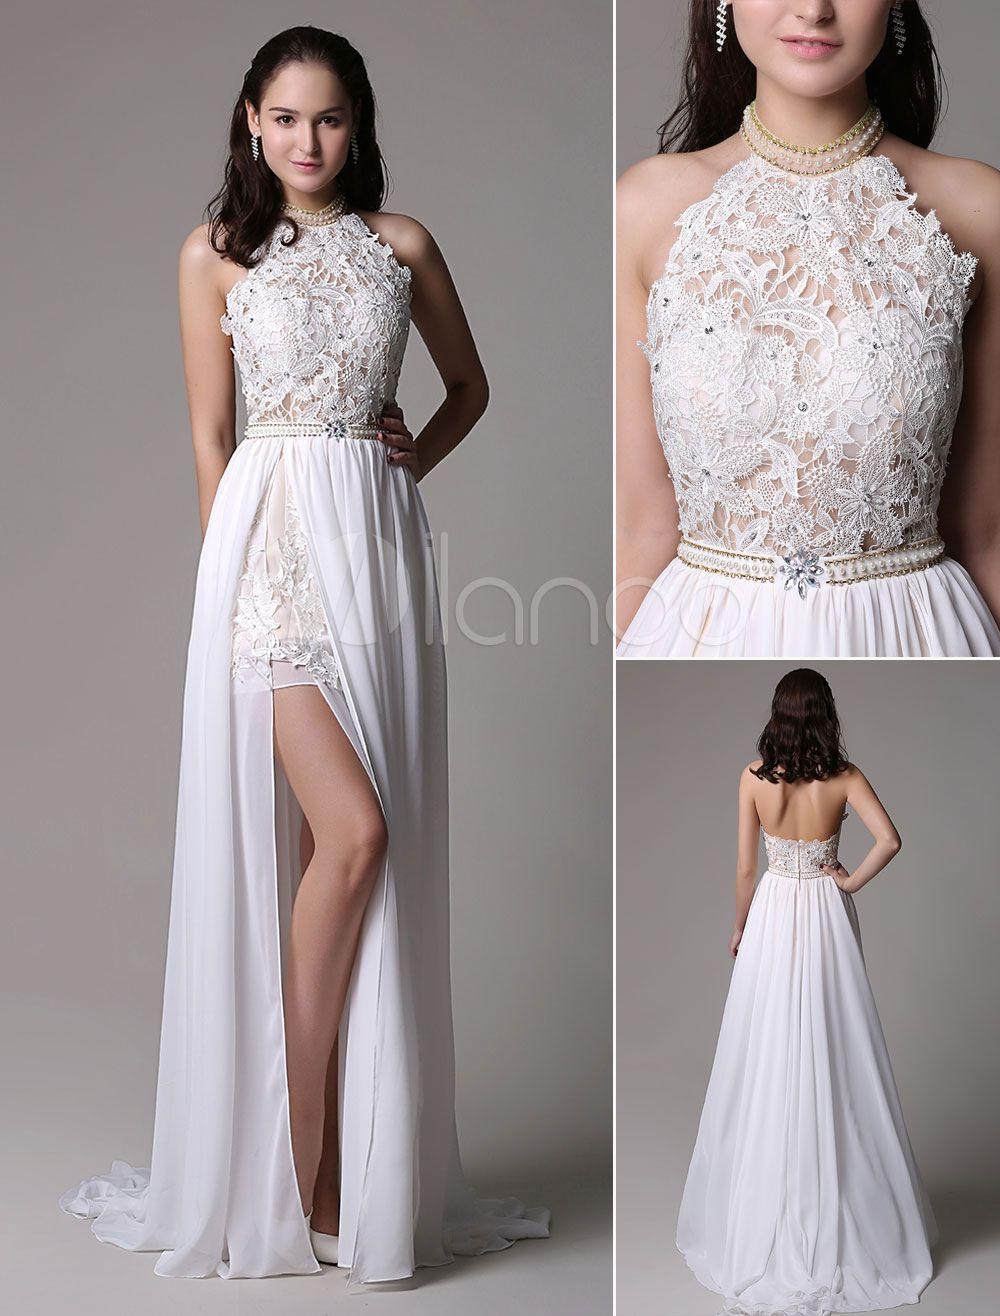 Abend Genial Abendkleid In Weiß Spezialgebiet10 Cool Abendkleid In Weiß Ärmel